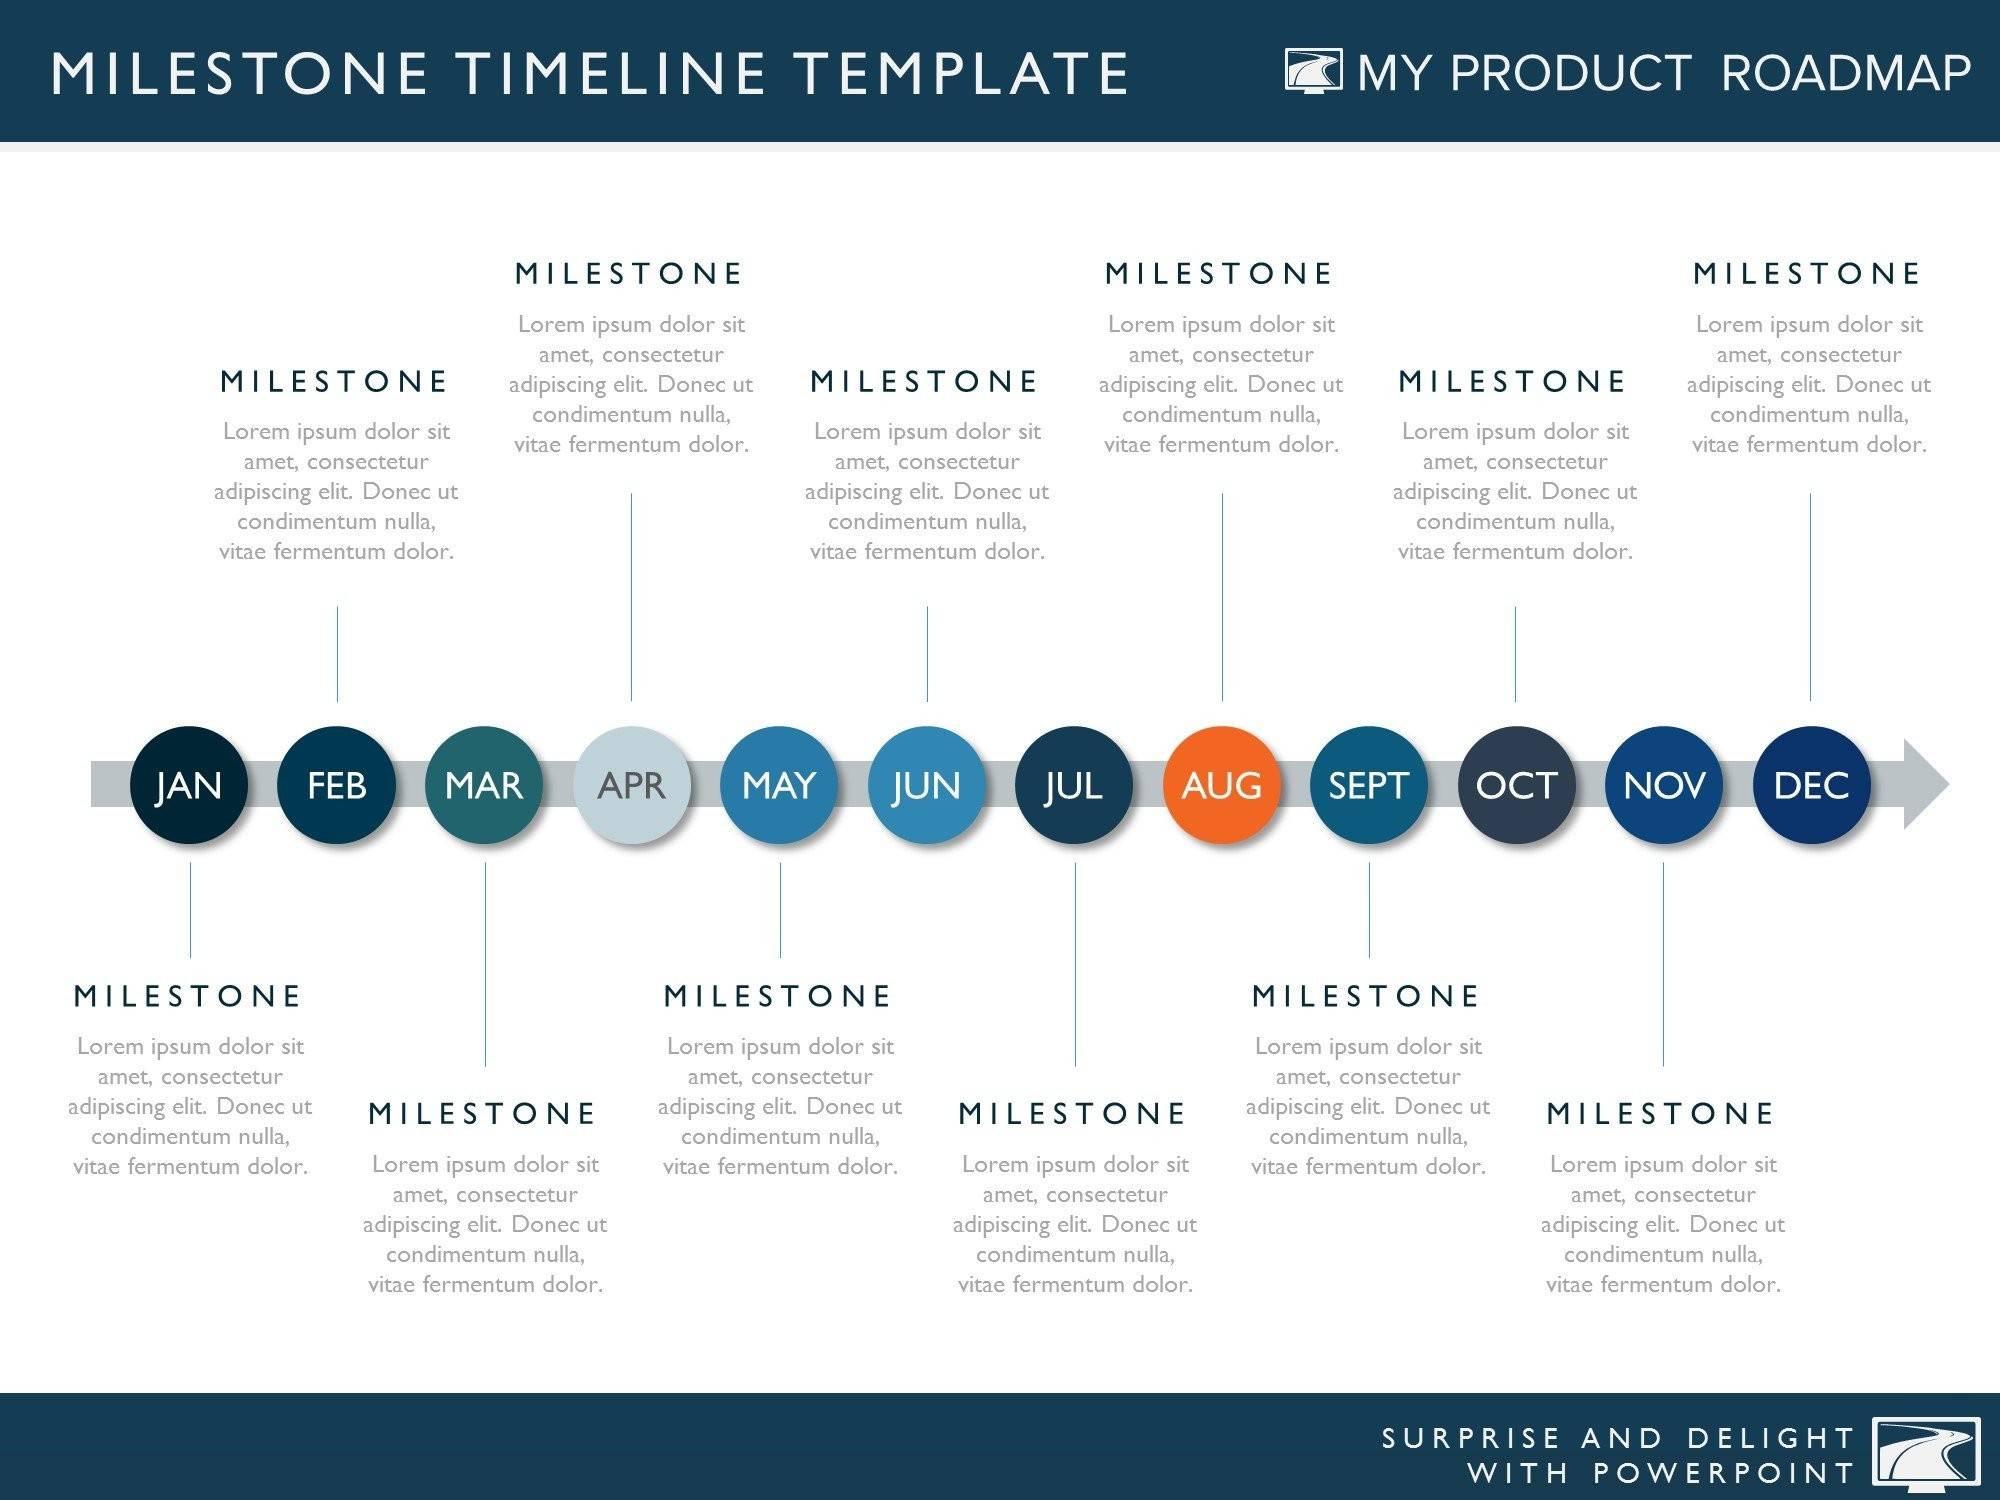 Roadmap Timeline Example